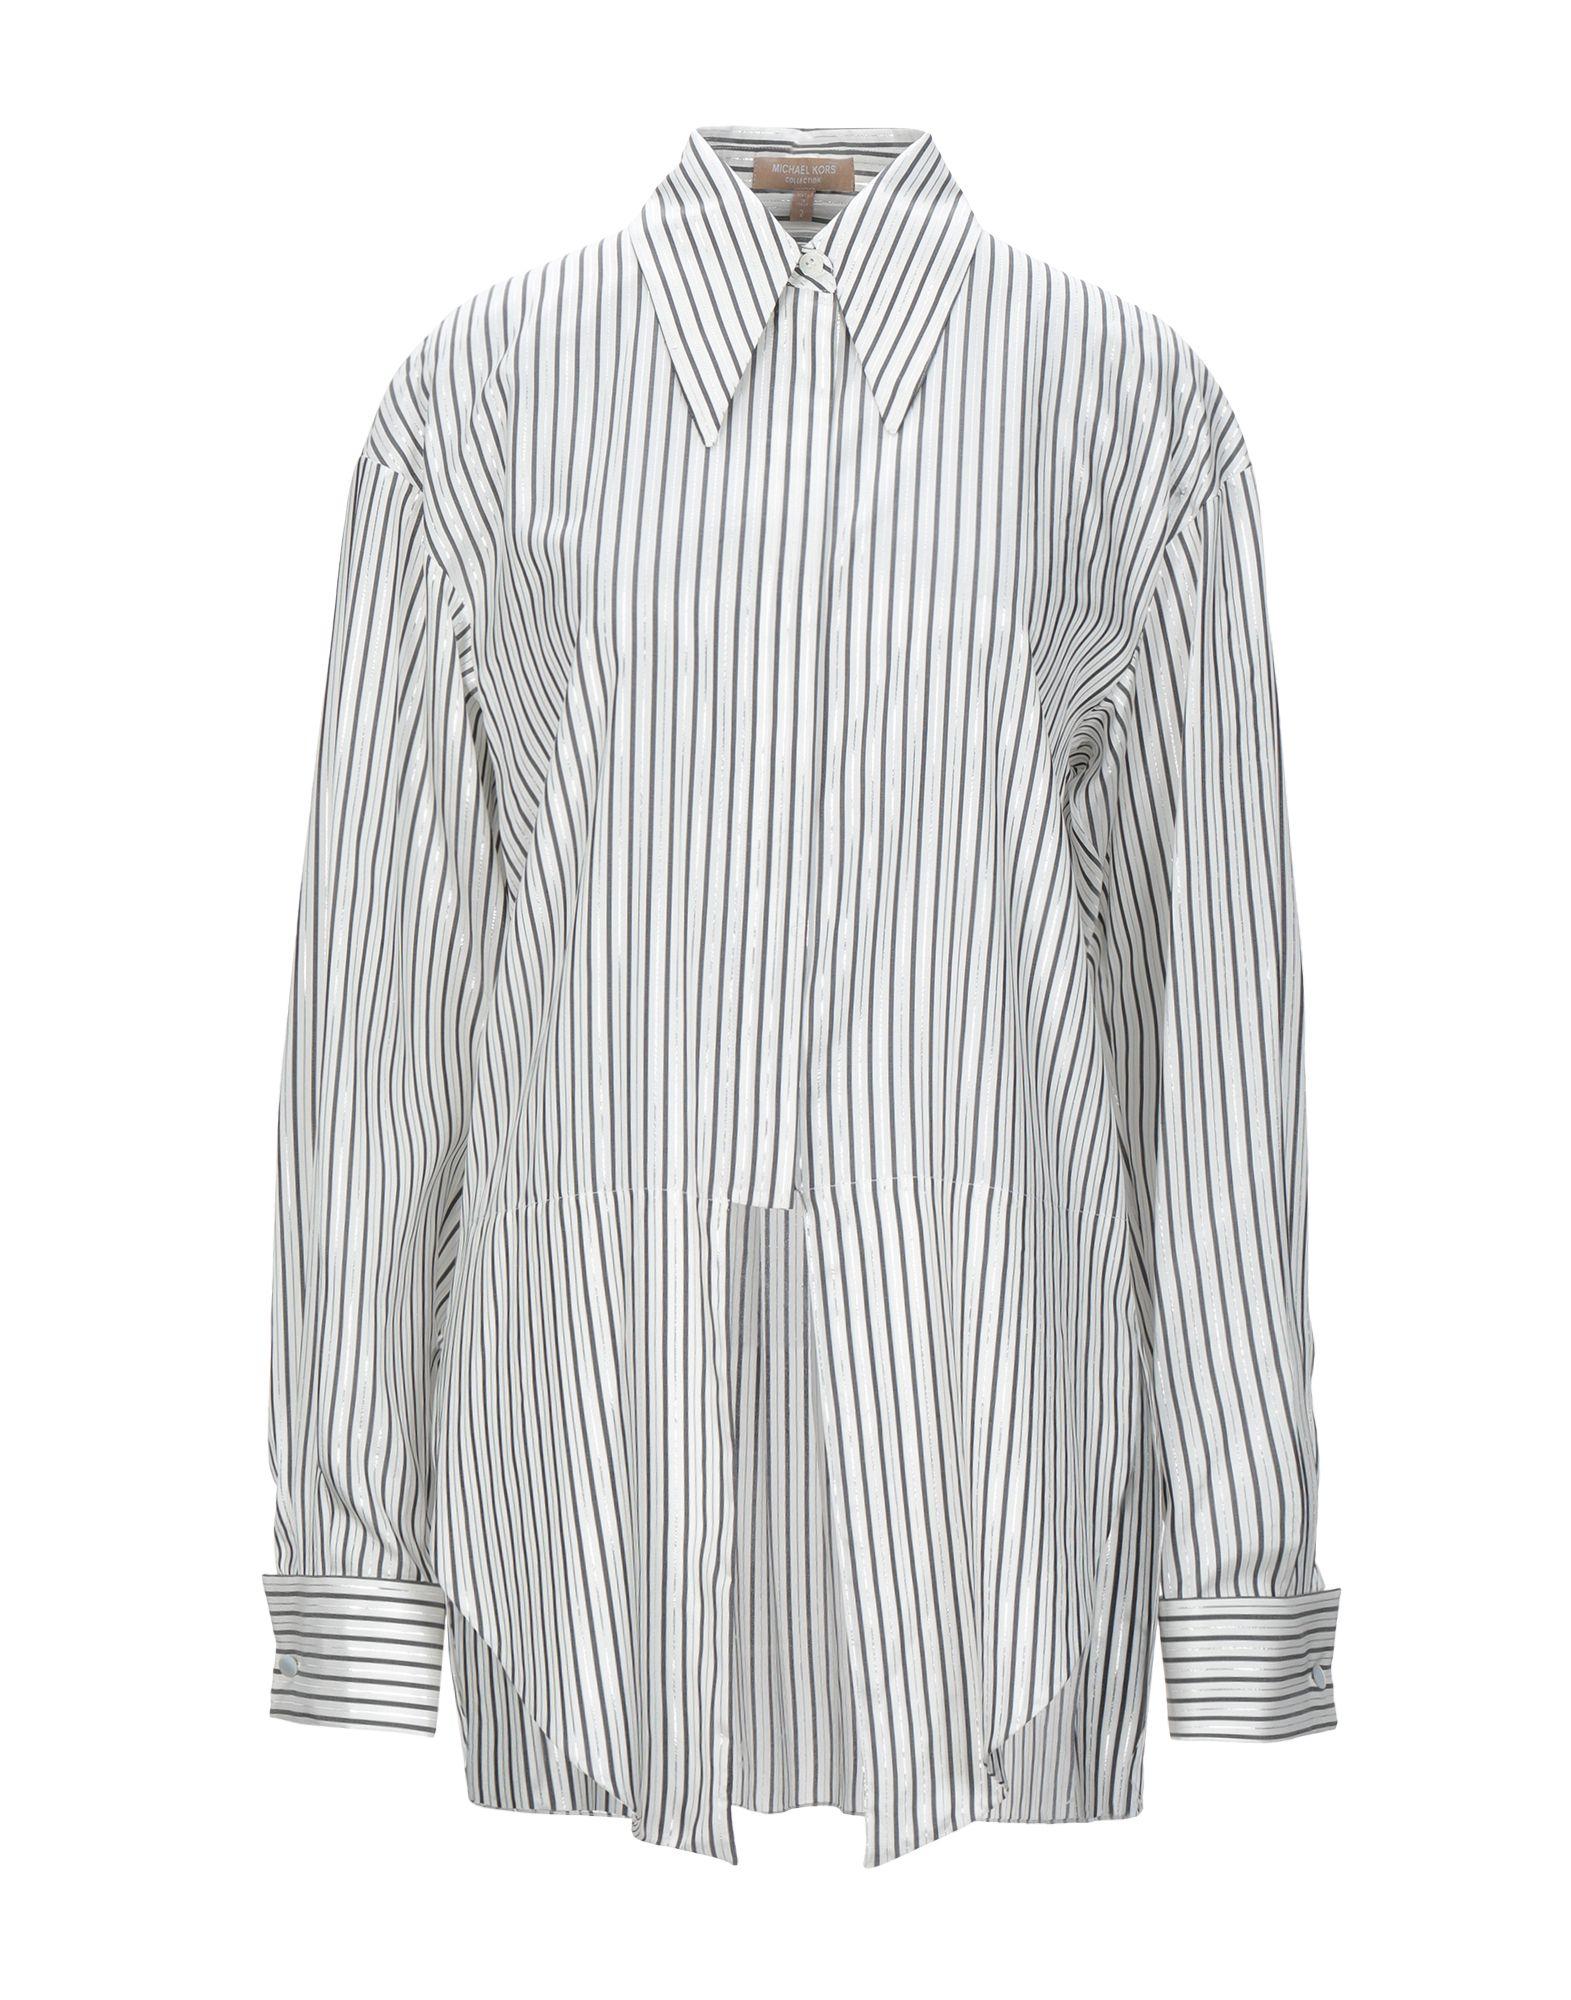 Фото - MICHAEL KORS COLLECTION Pубашка michael kors collection юбка длиной 3 4